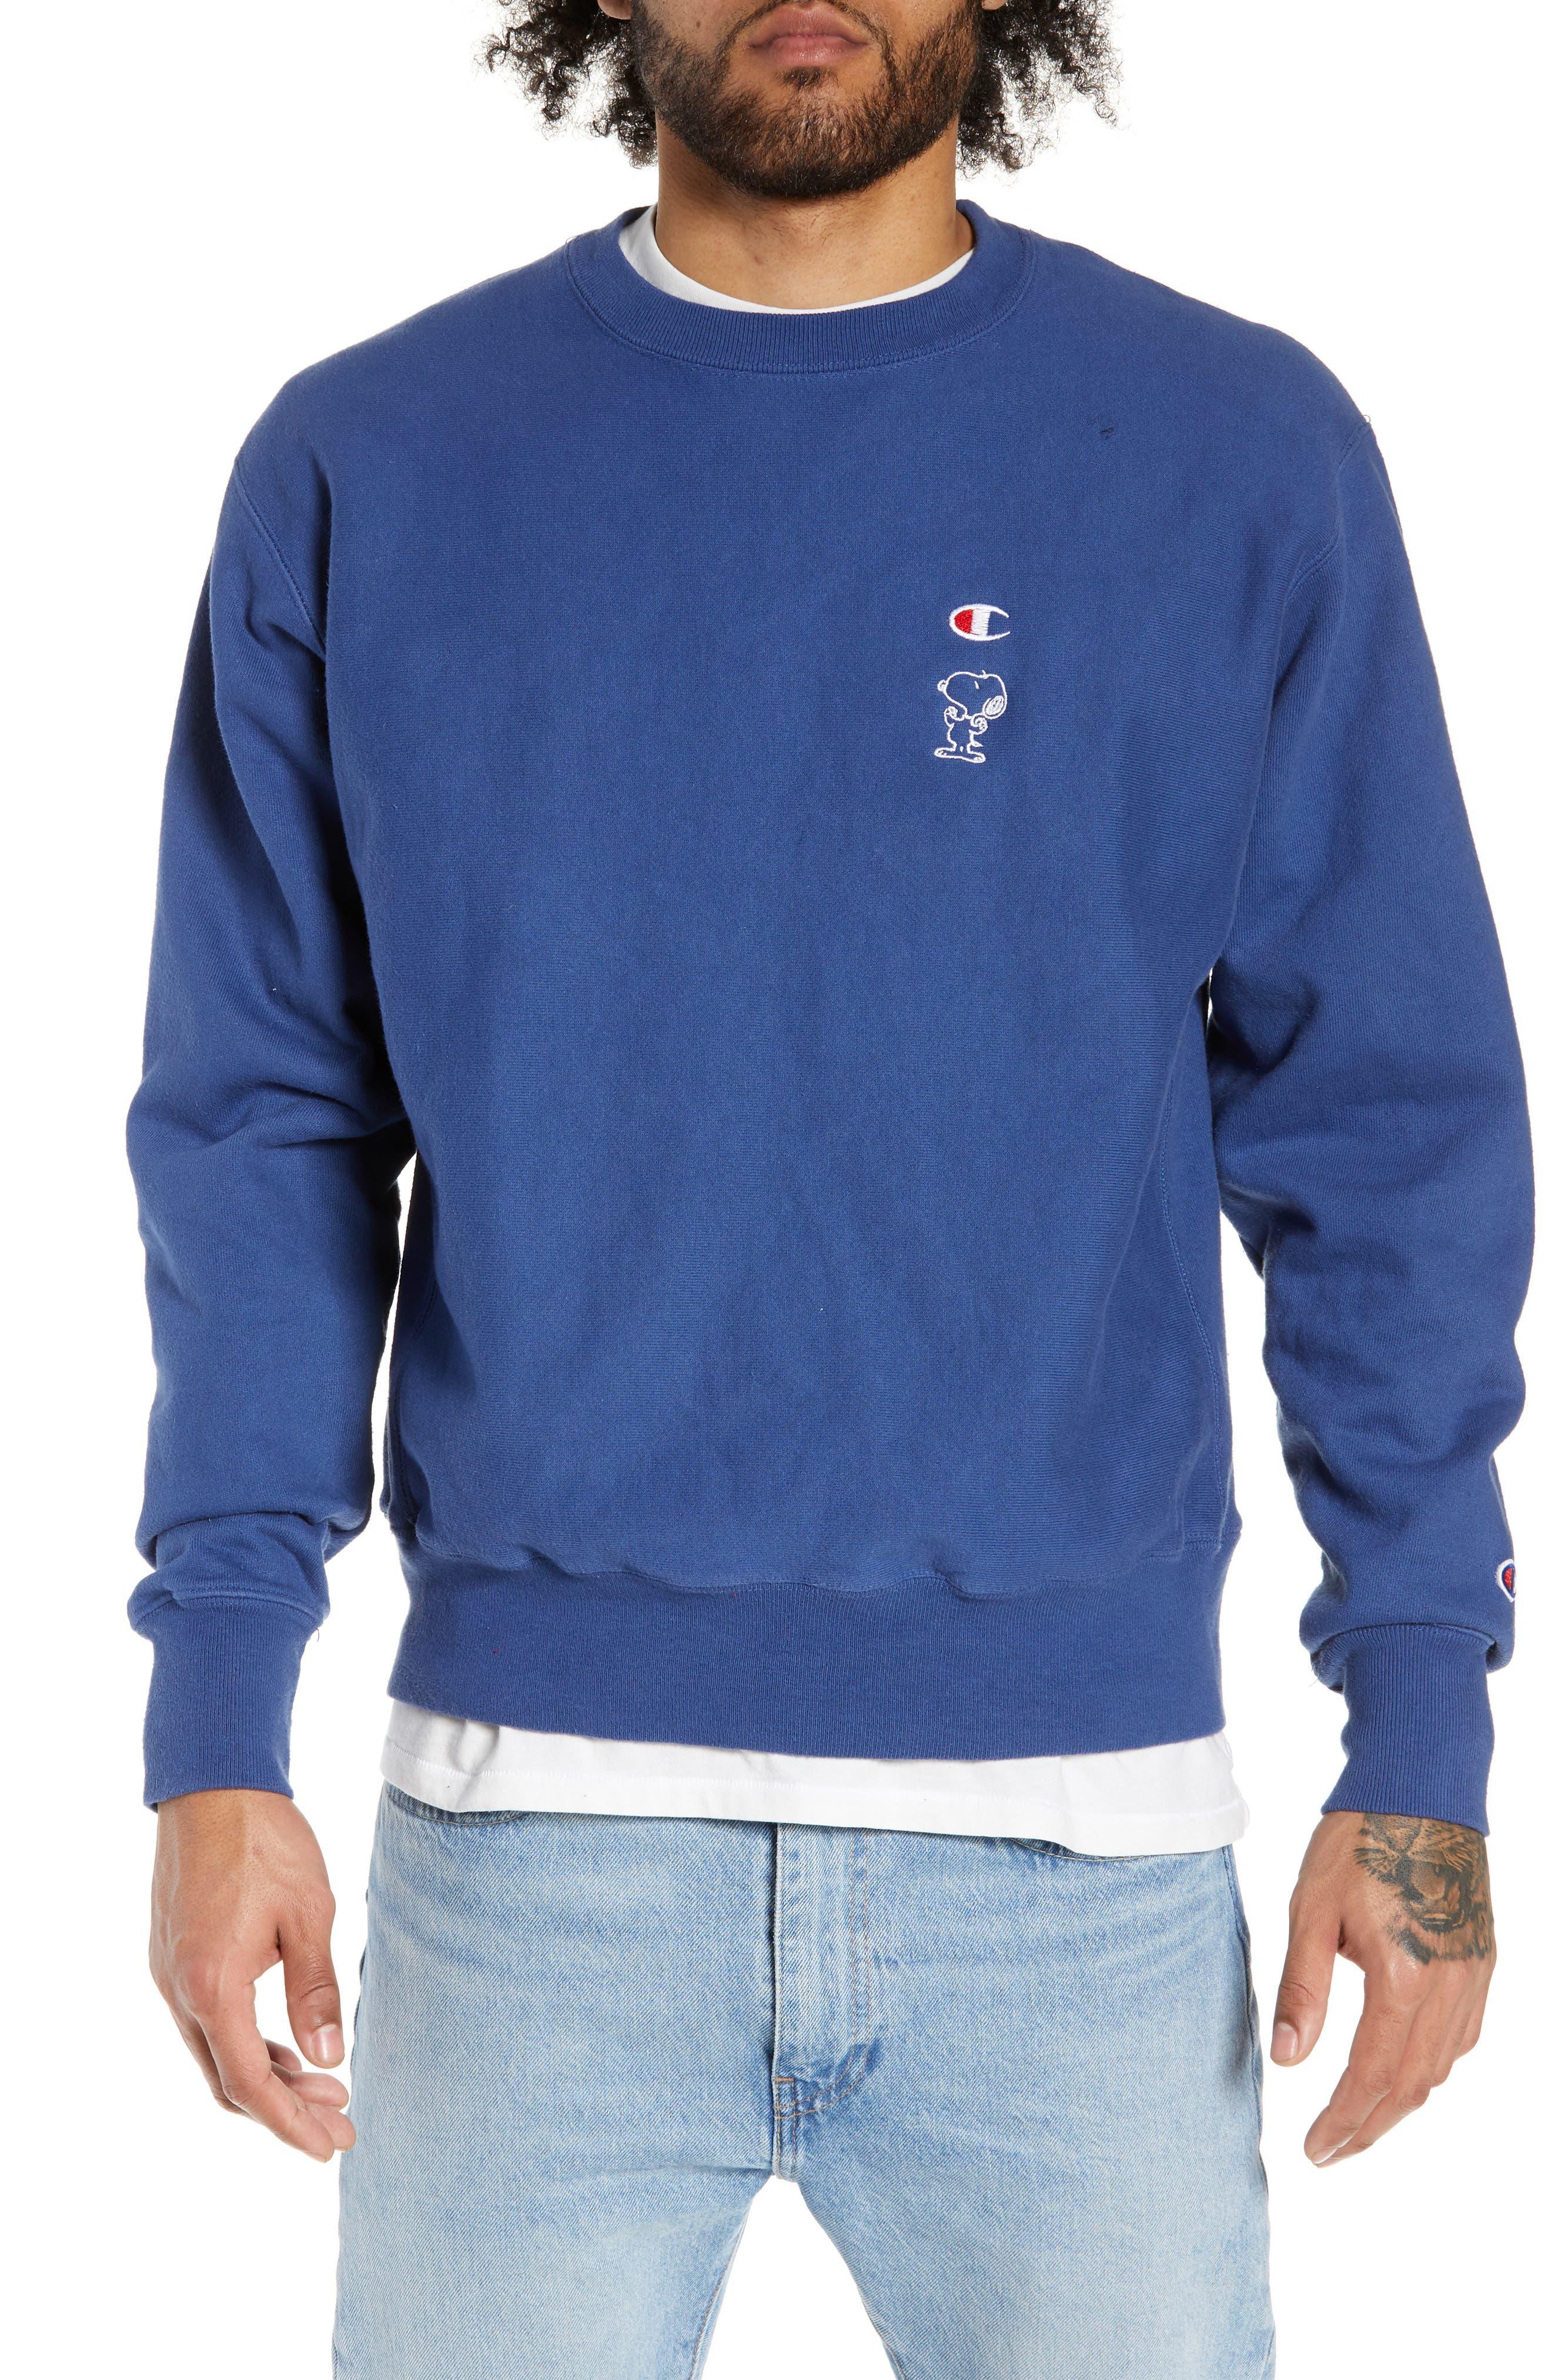 Reverse Weave<sup>®</sup> Snoopy Sweatshirt,                             Main thumbnail 1, color,                             DUTCH BLUE